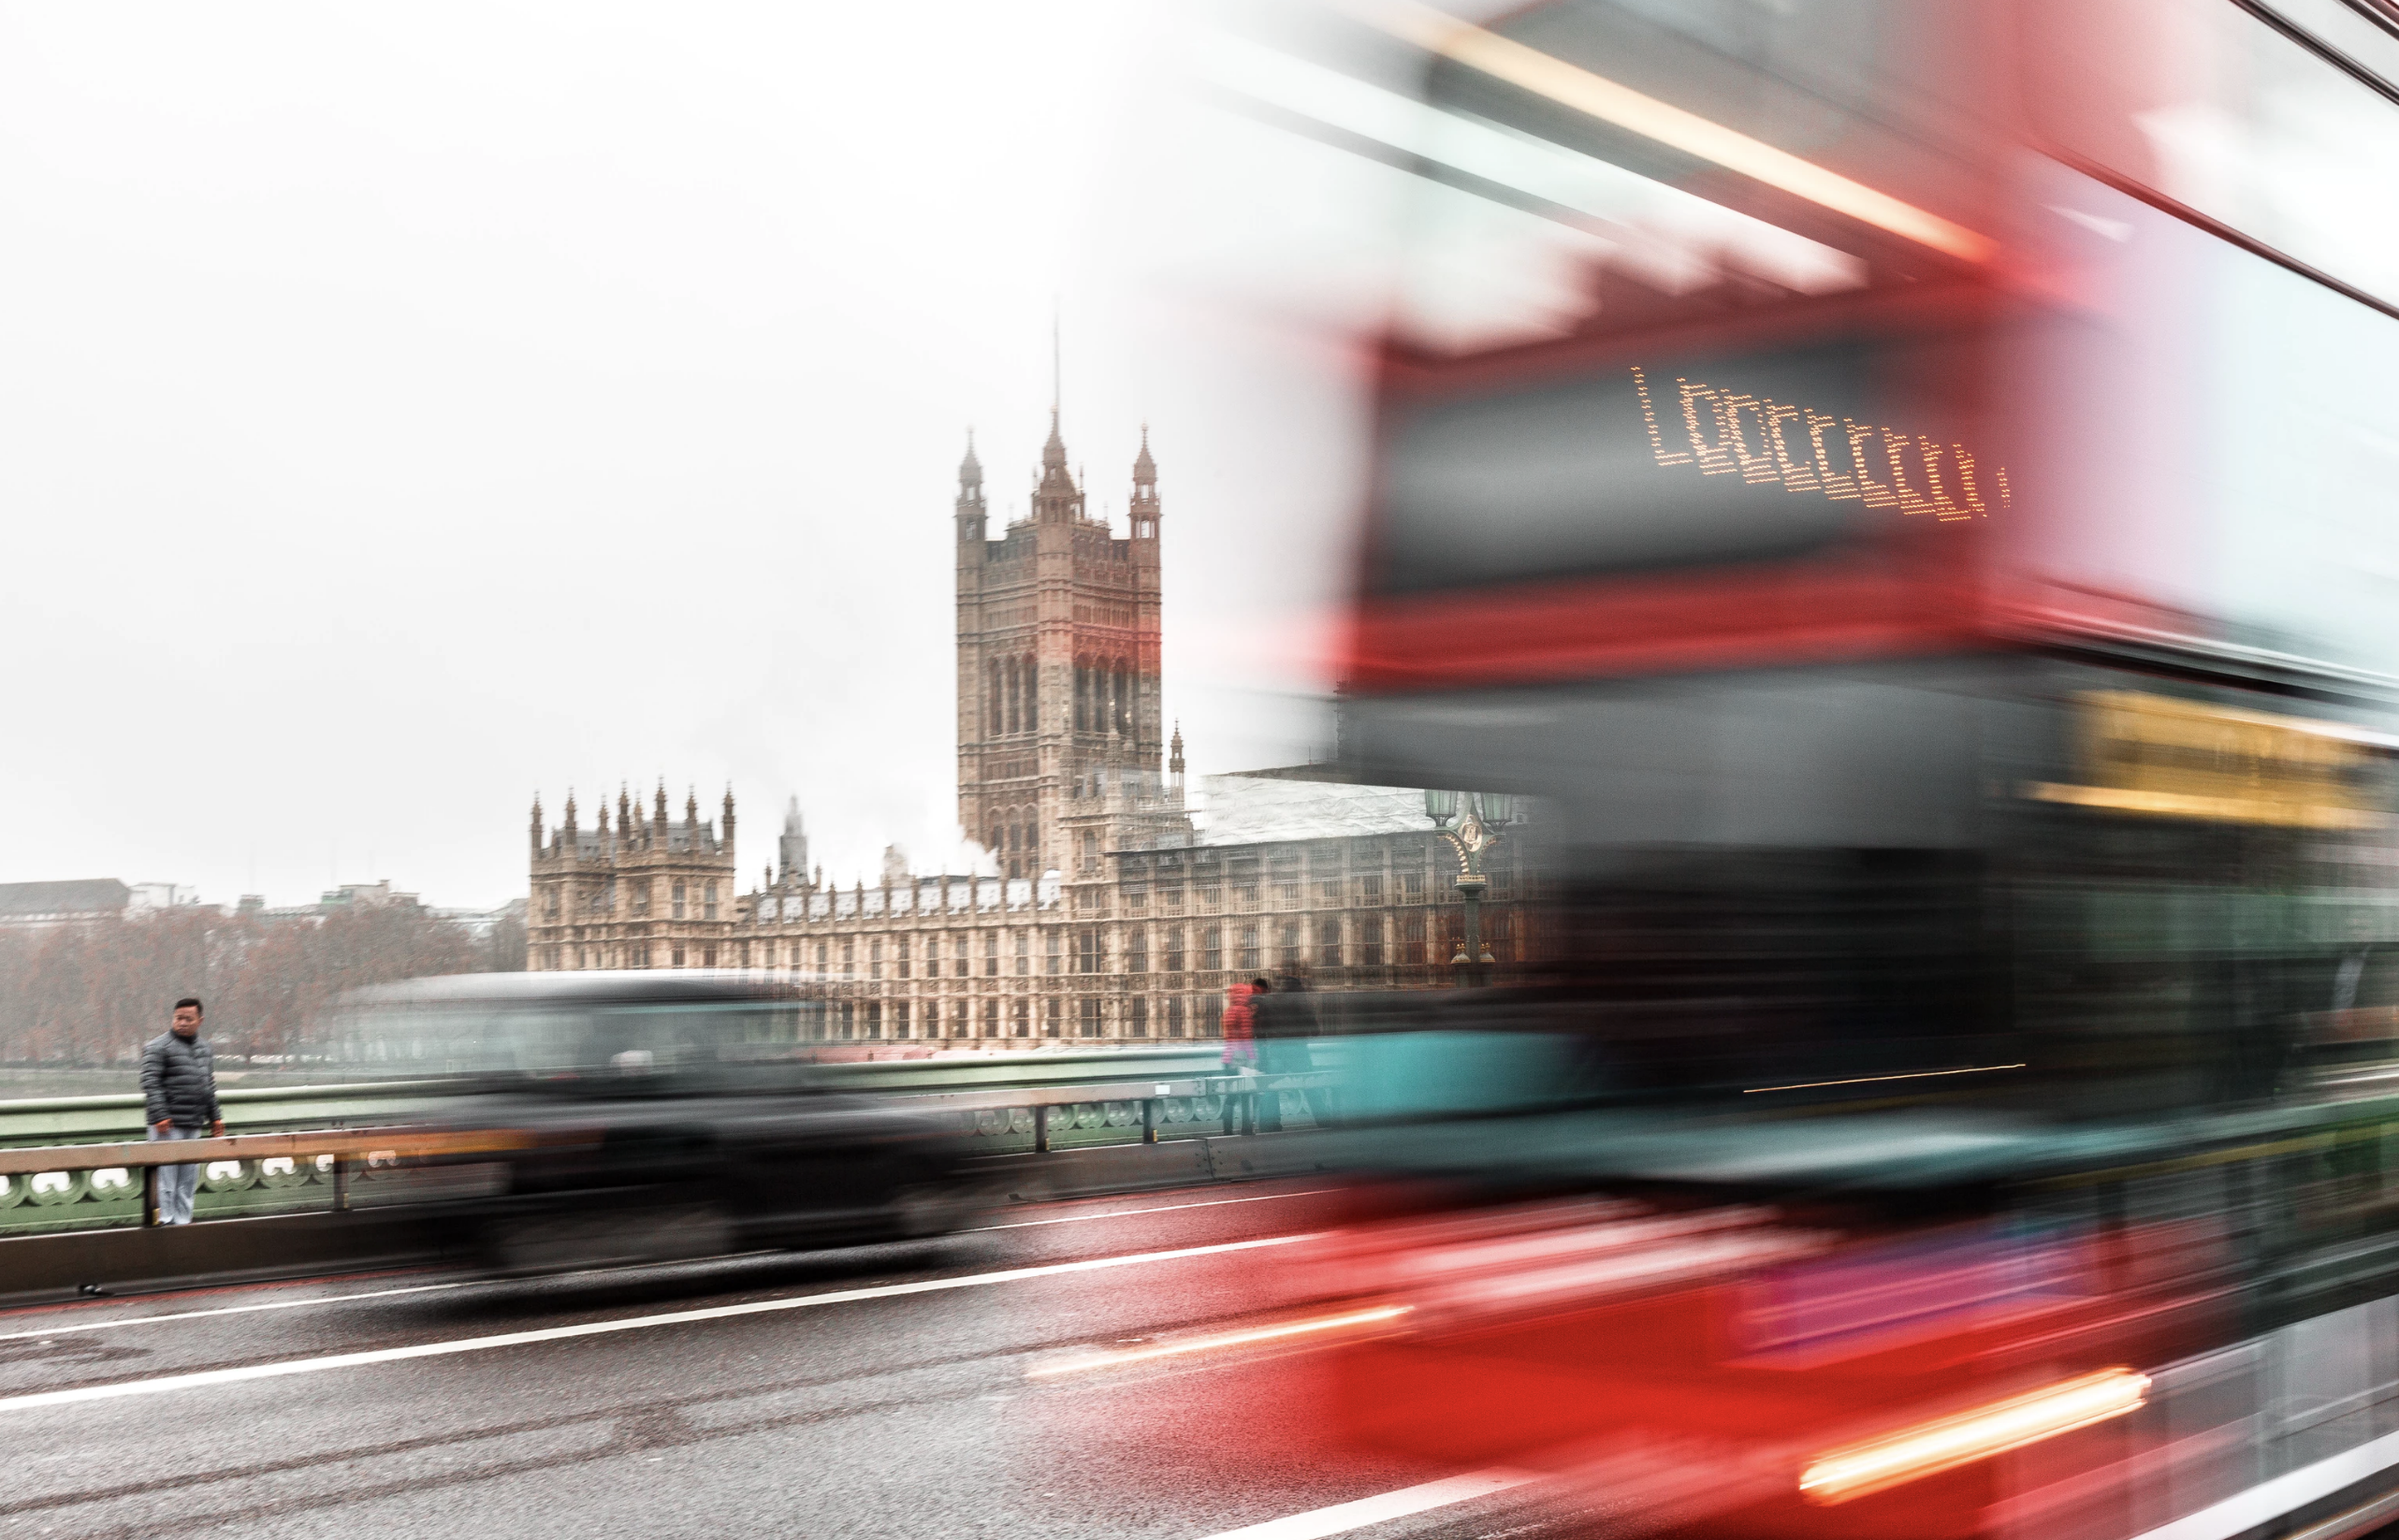 London Bus Going Over London Bridge